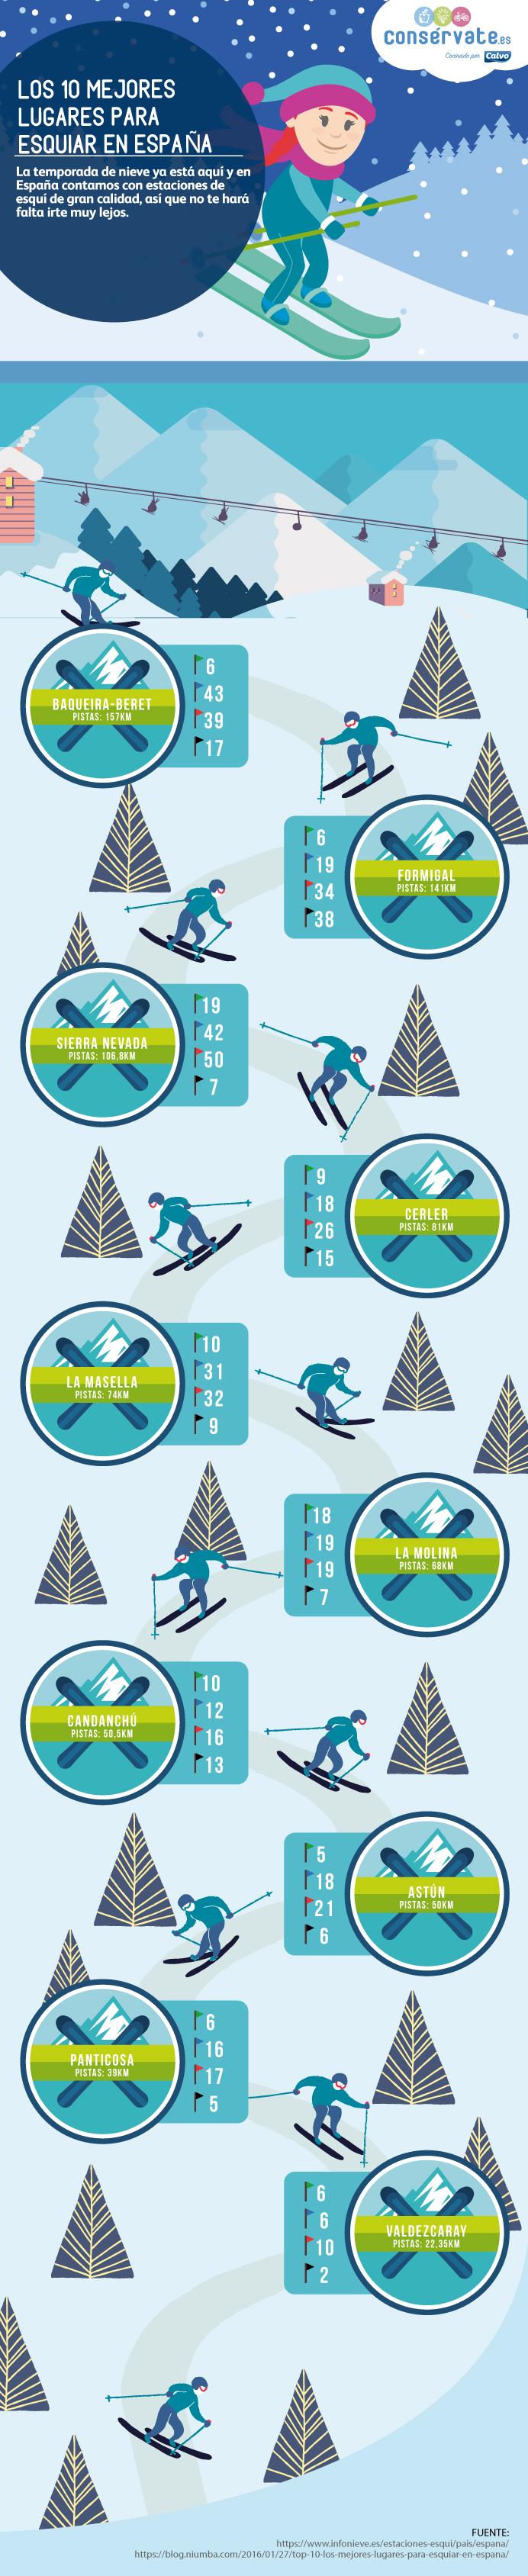 10 mejores sitios para esquiar en España